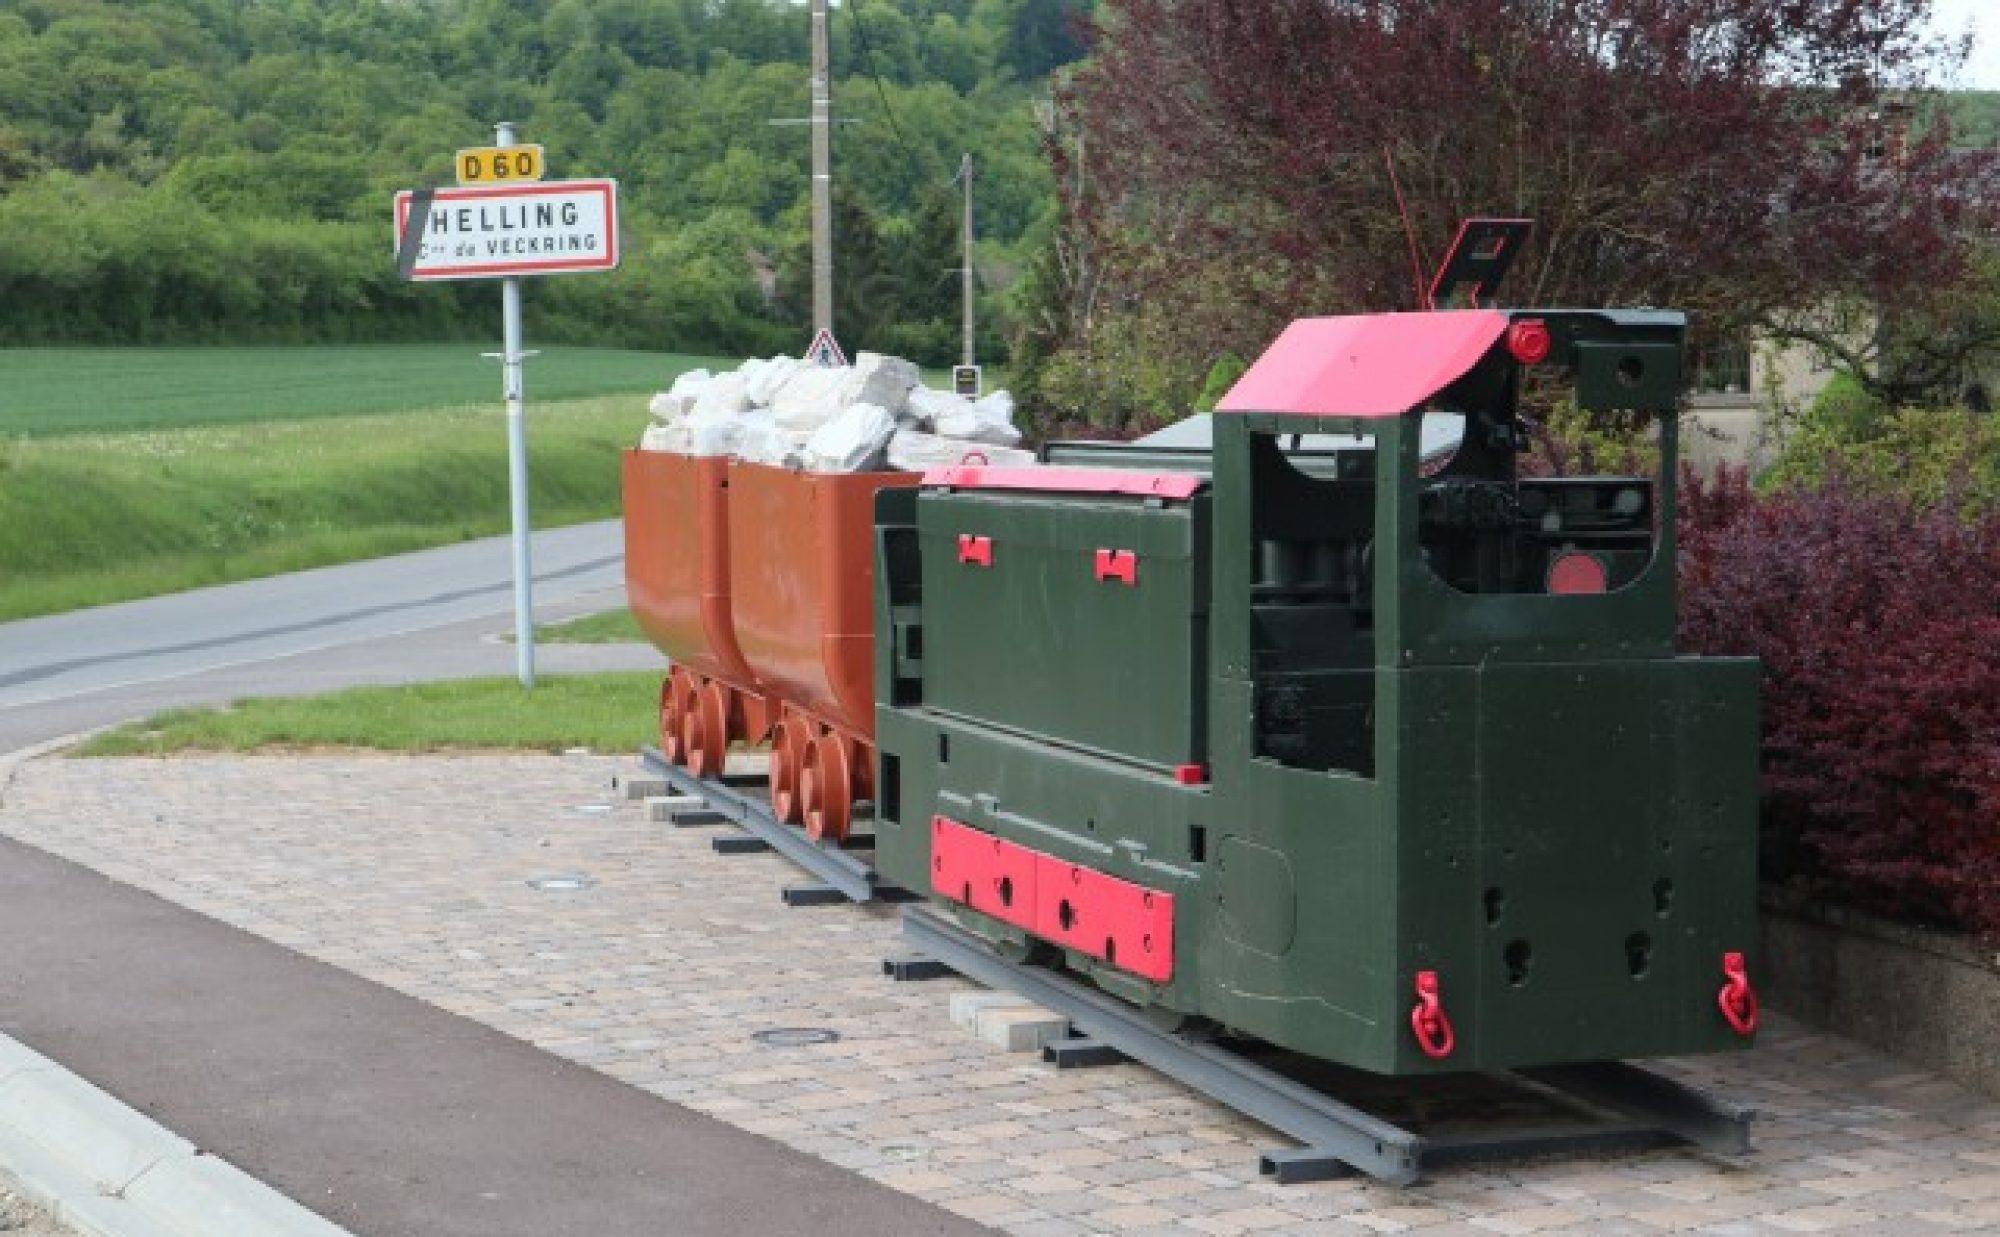 Commune de Veckring-Helling